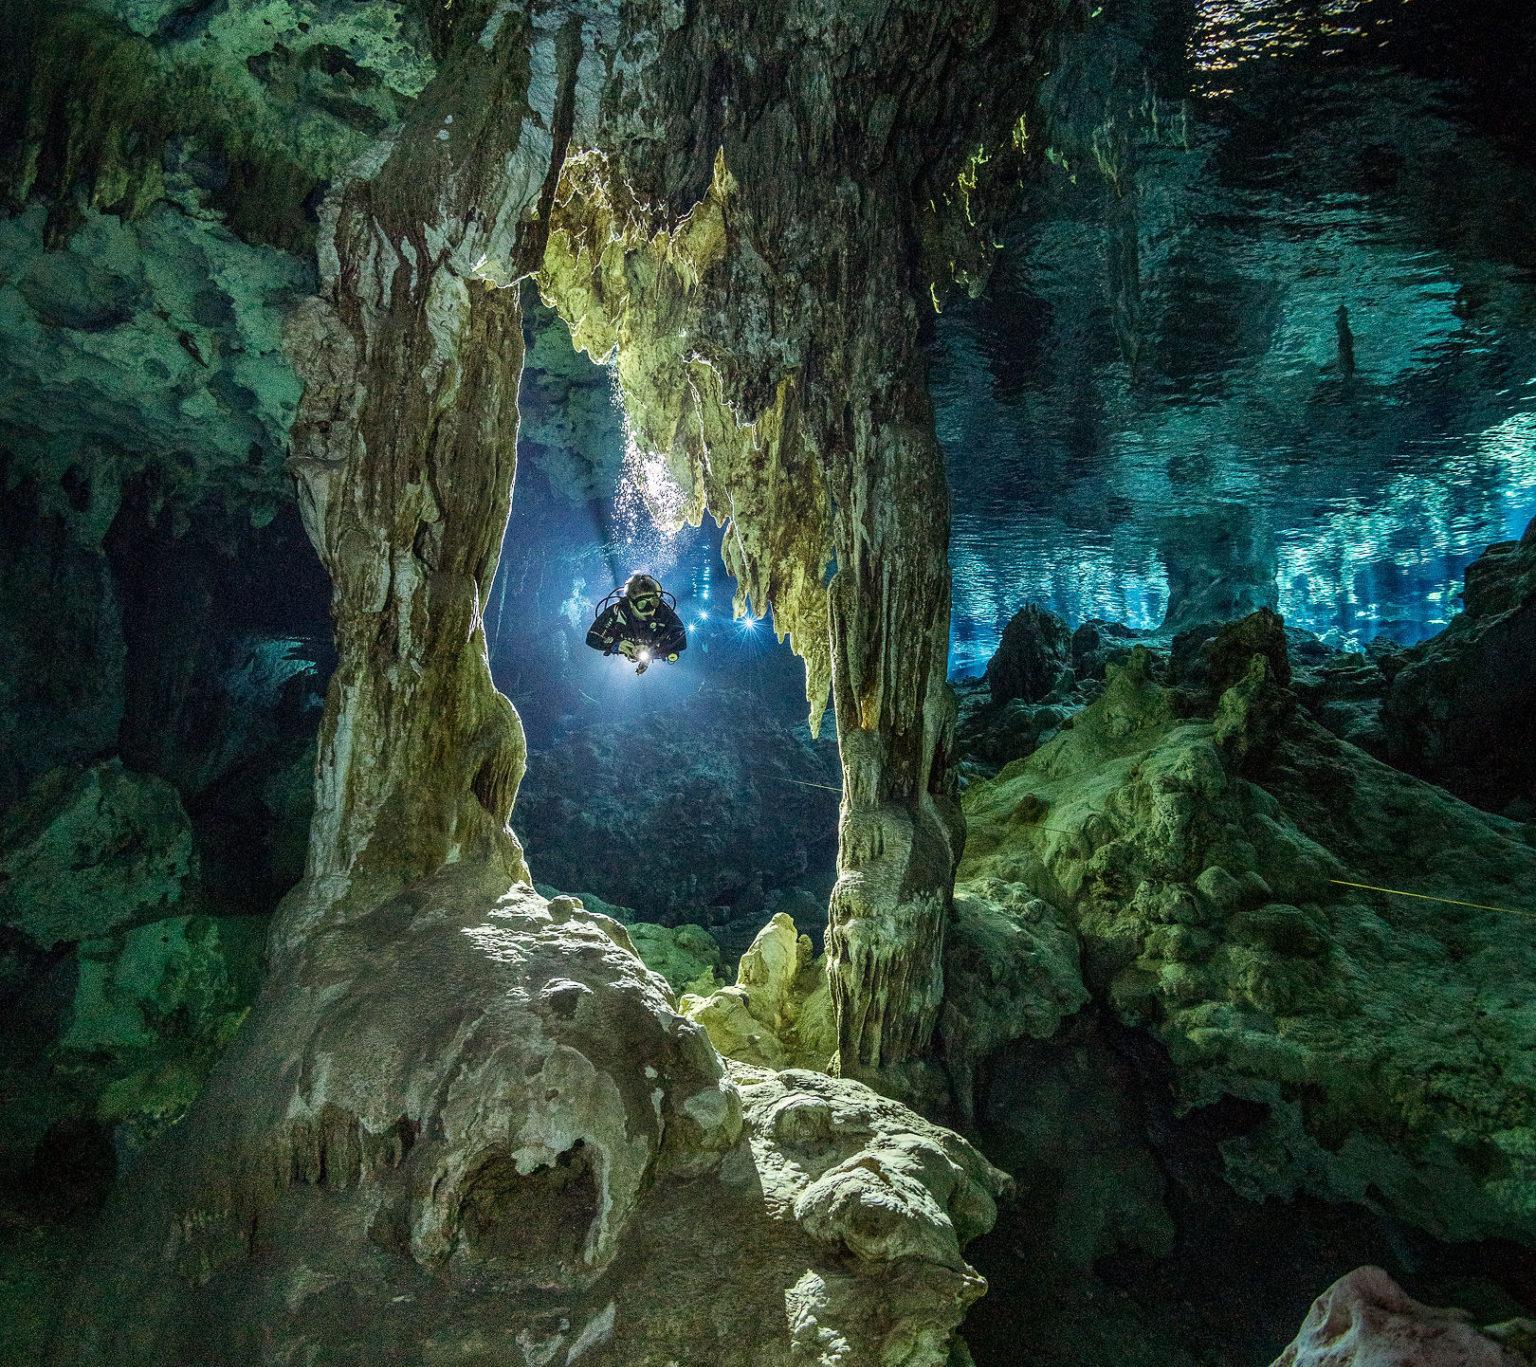 Playa Del Carmen Cavern Scuba Diving in Mexico (2 cenotes)